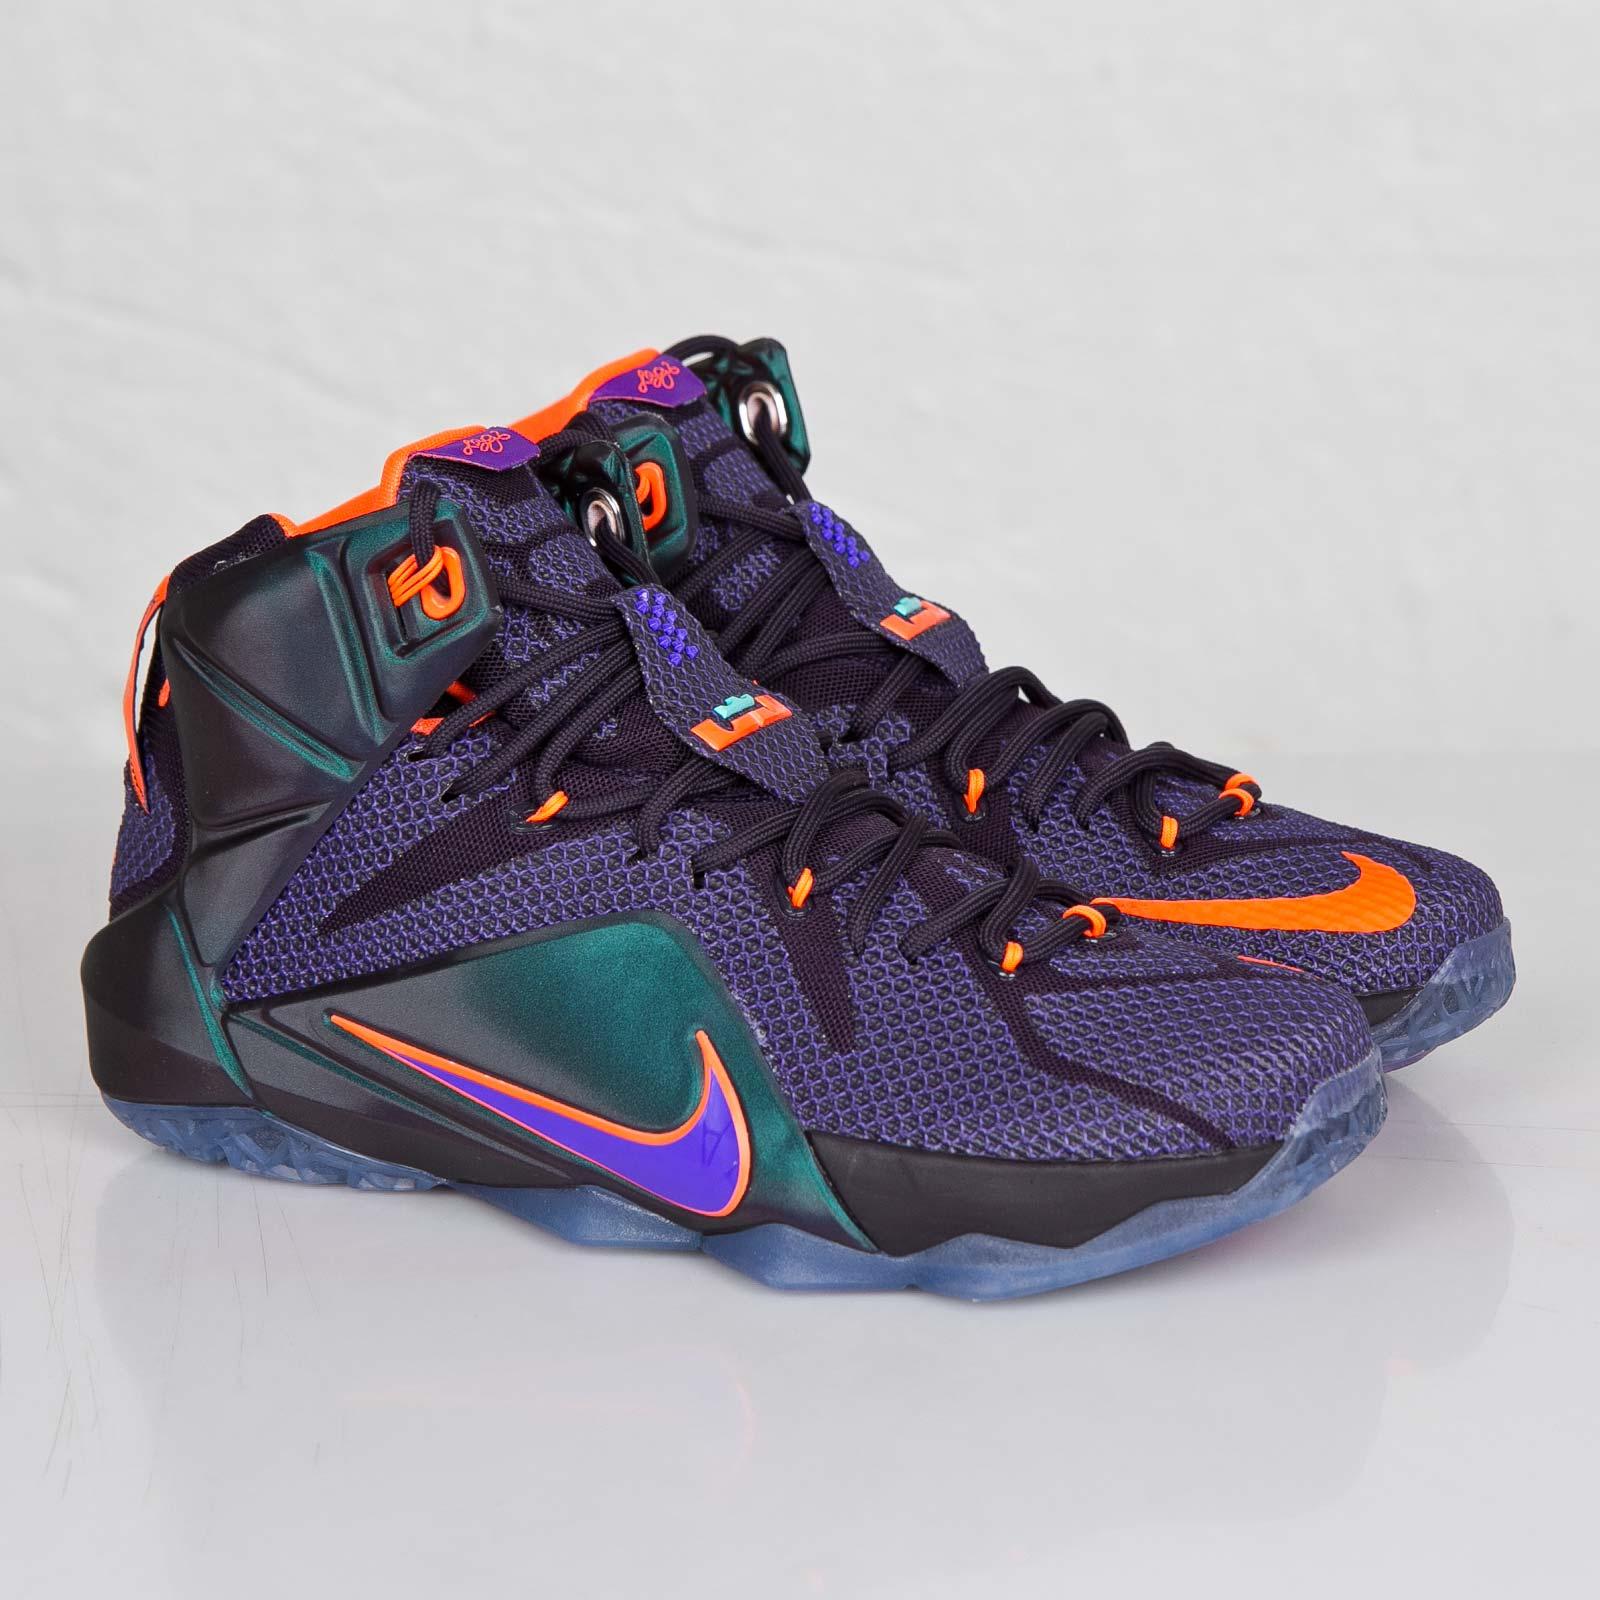 286ed3b2bb8f59 Nike Lebron XII - 684593-583 - Sneakersnstuff